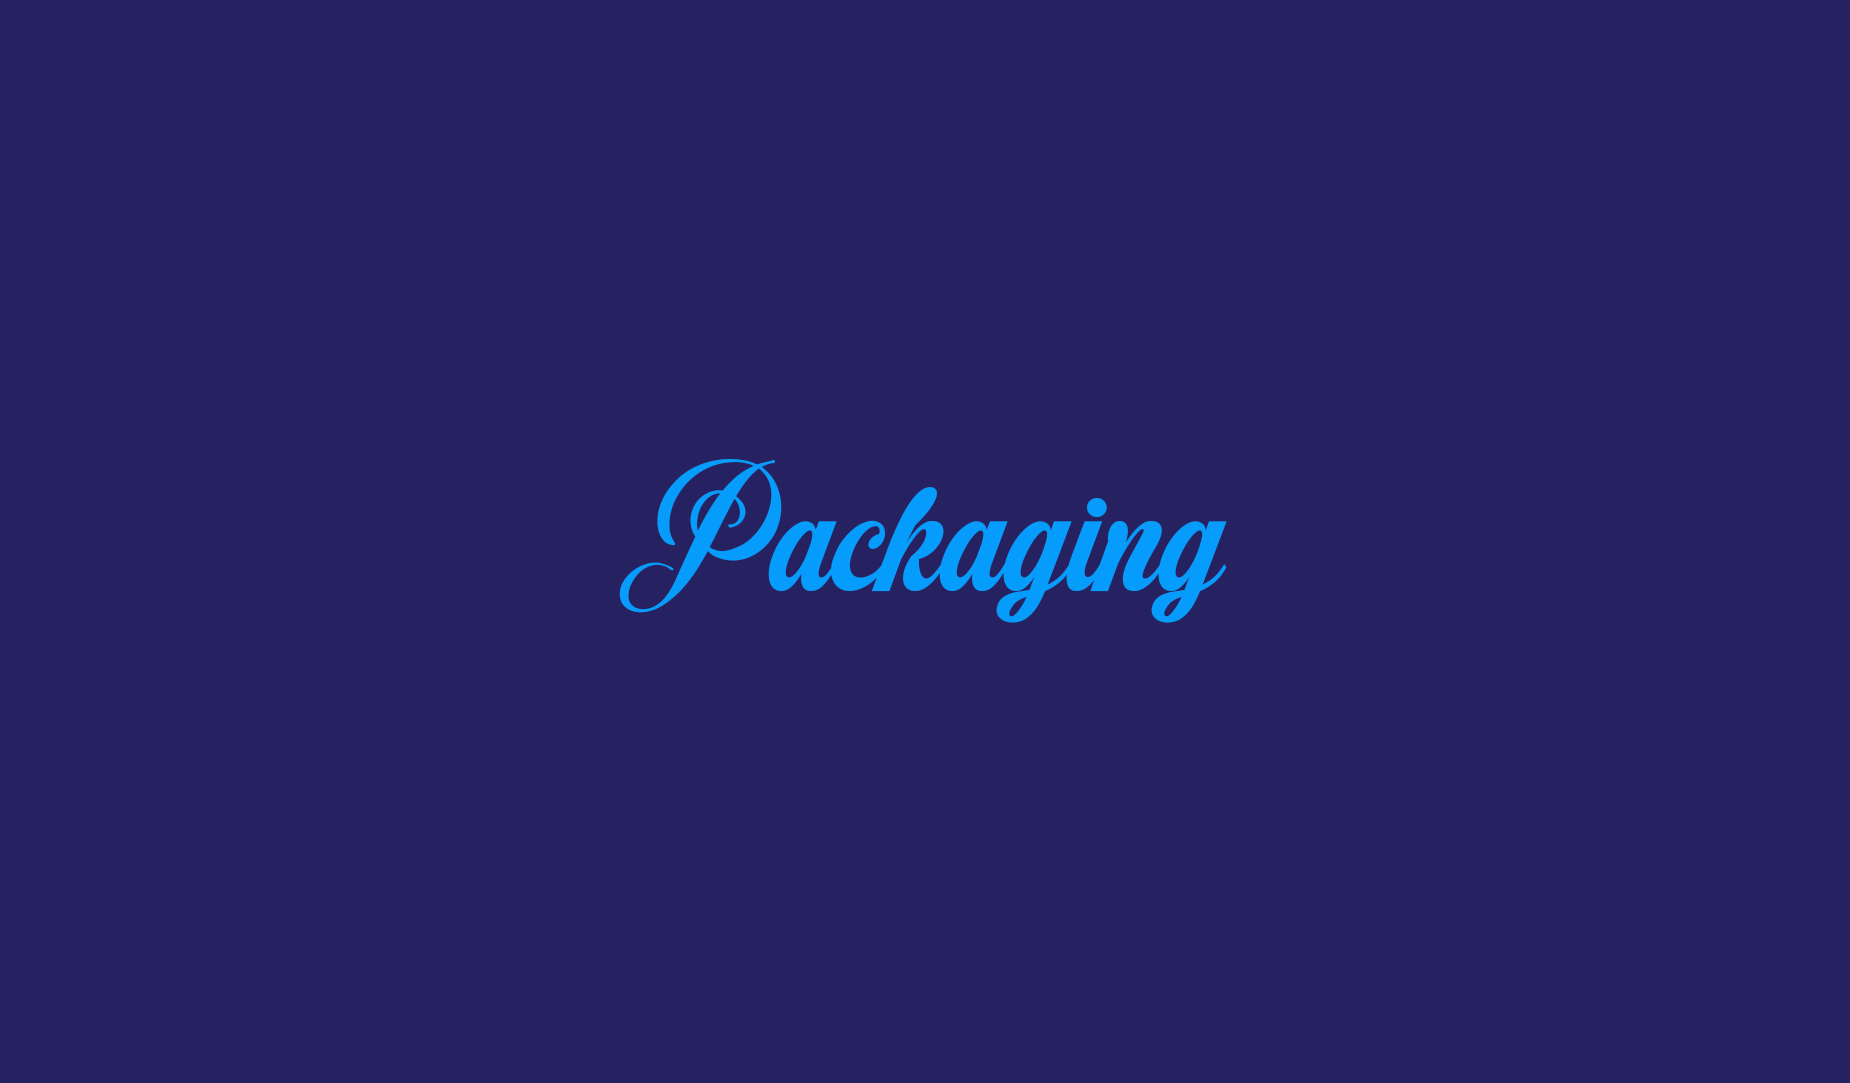 Packaging Design | Product Rendering